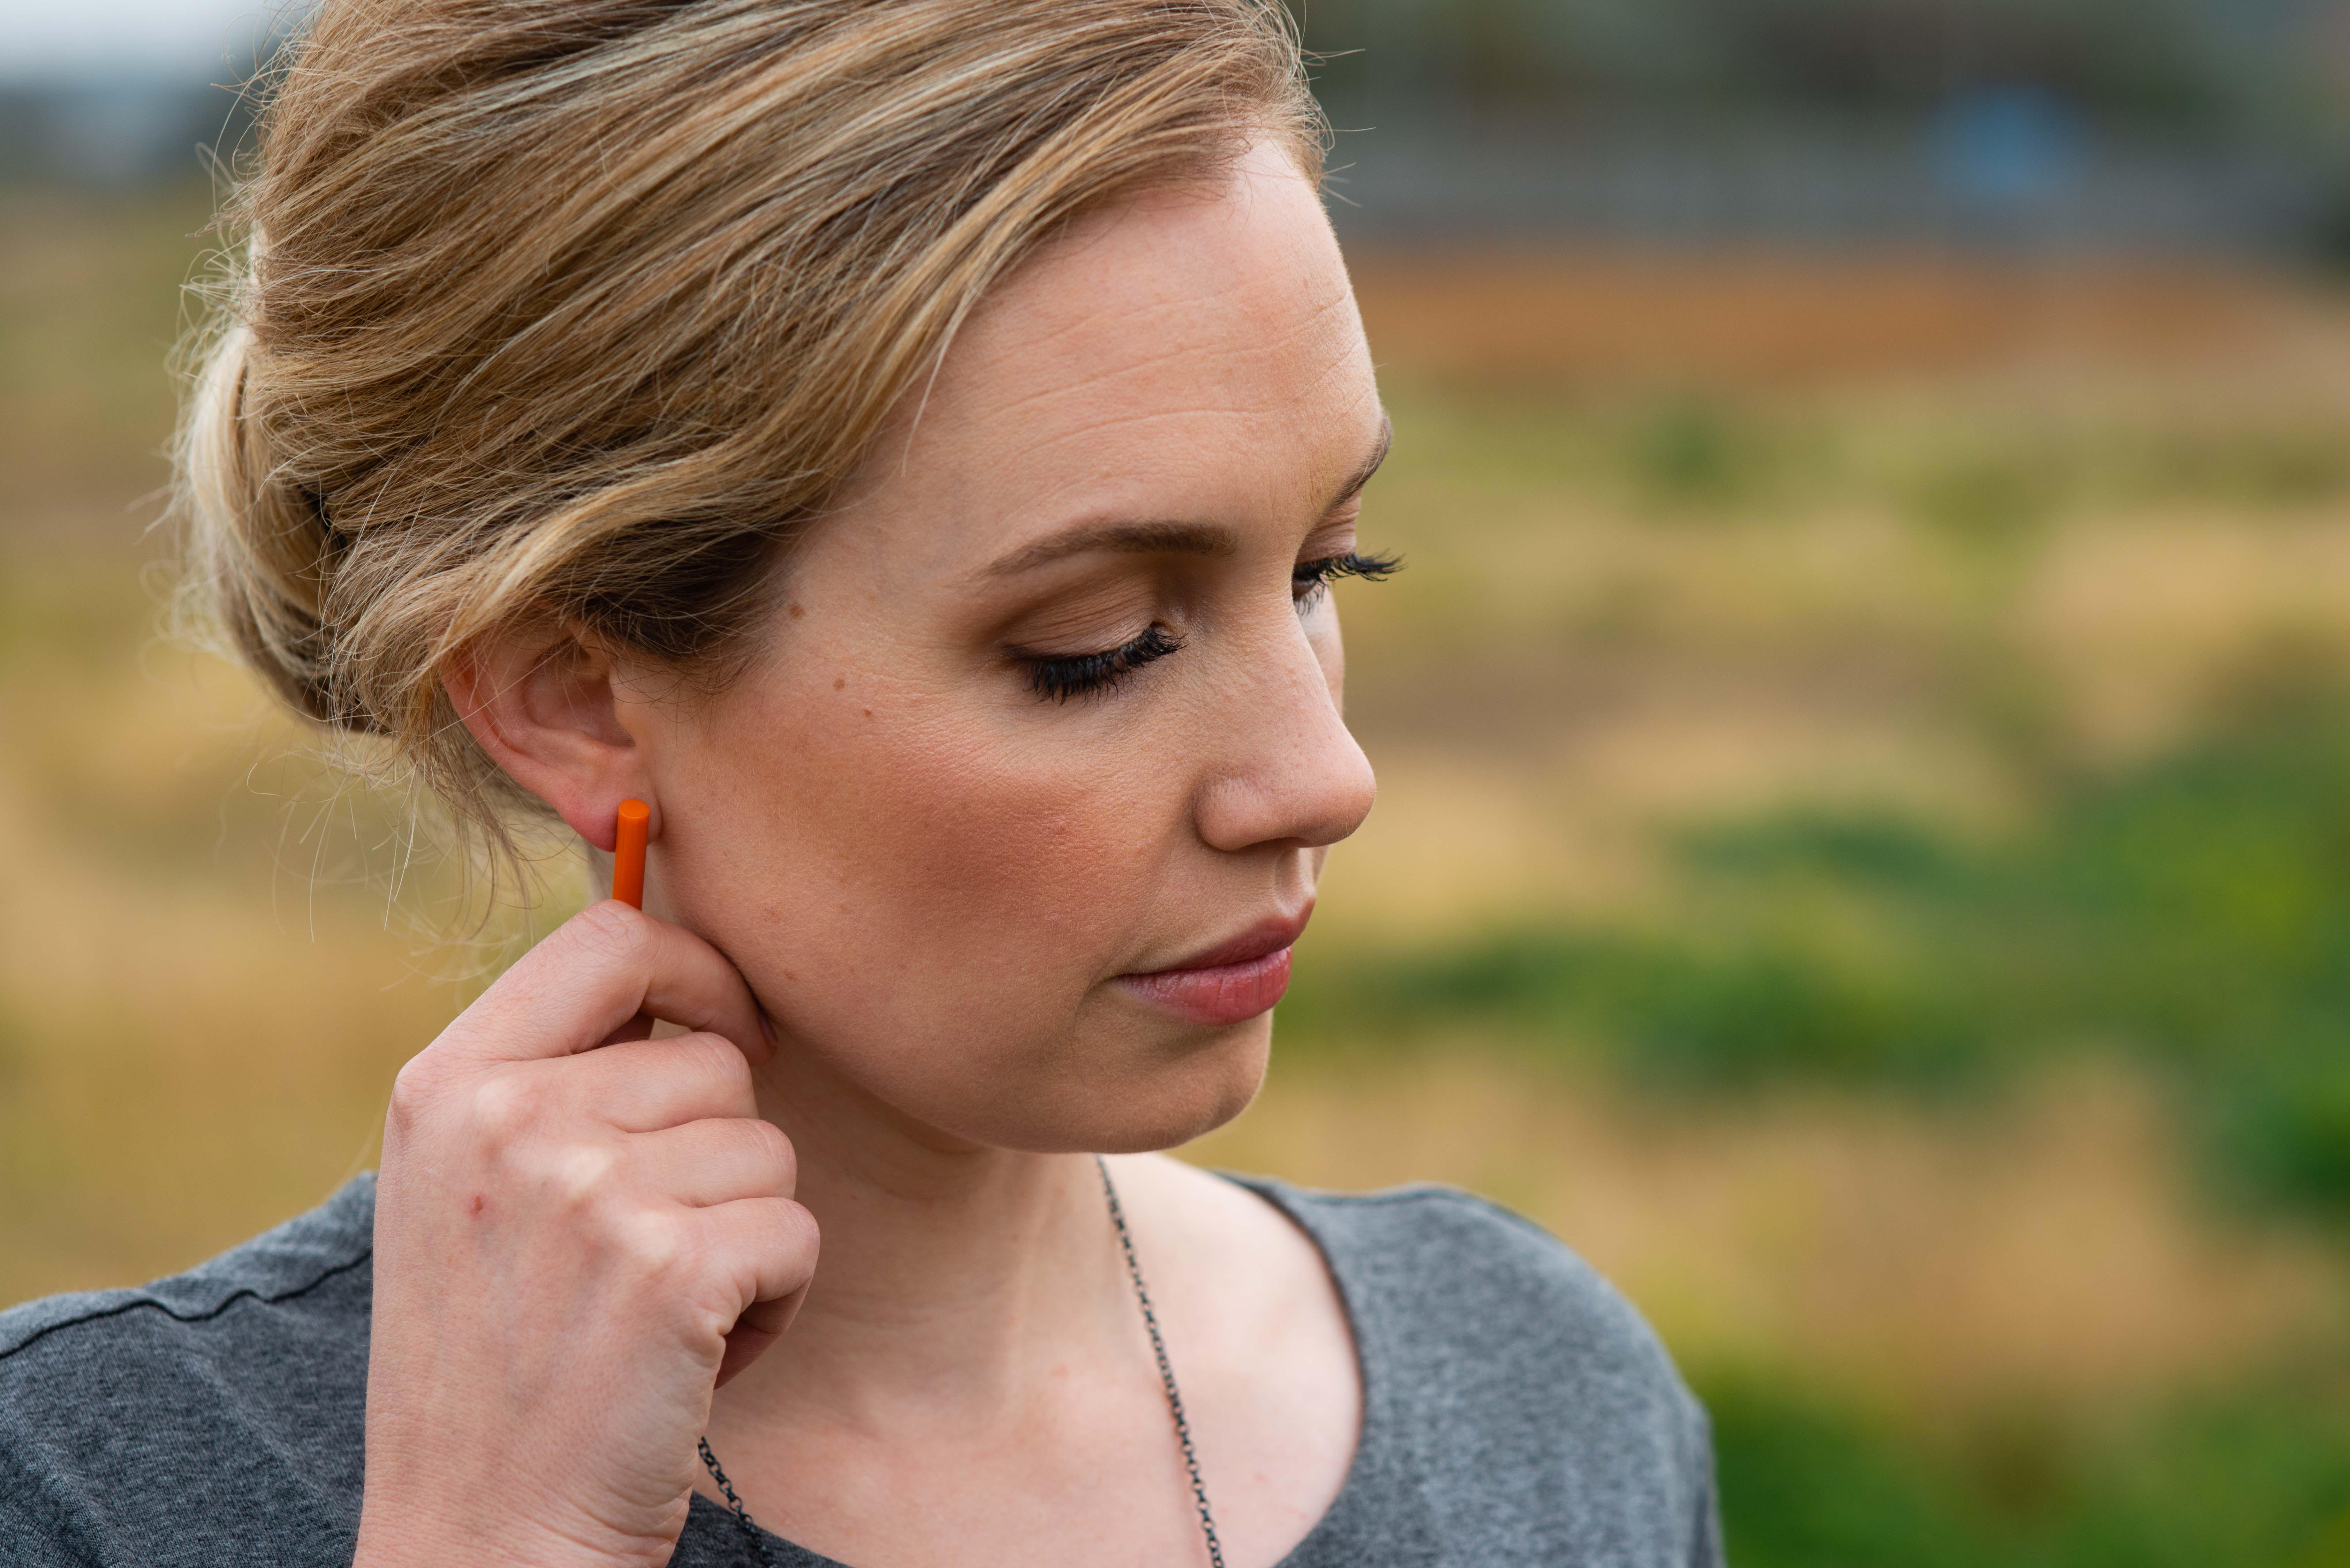 Orange Post Earrings